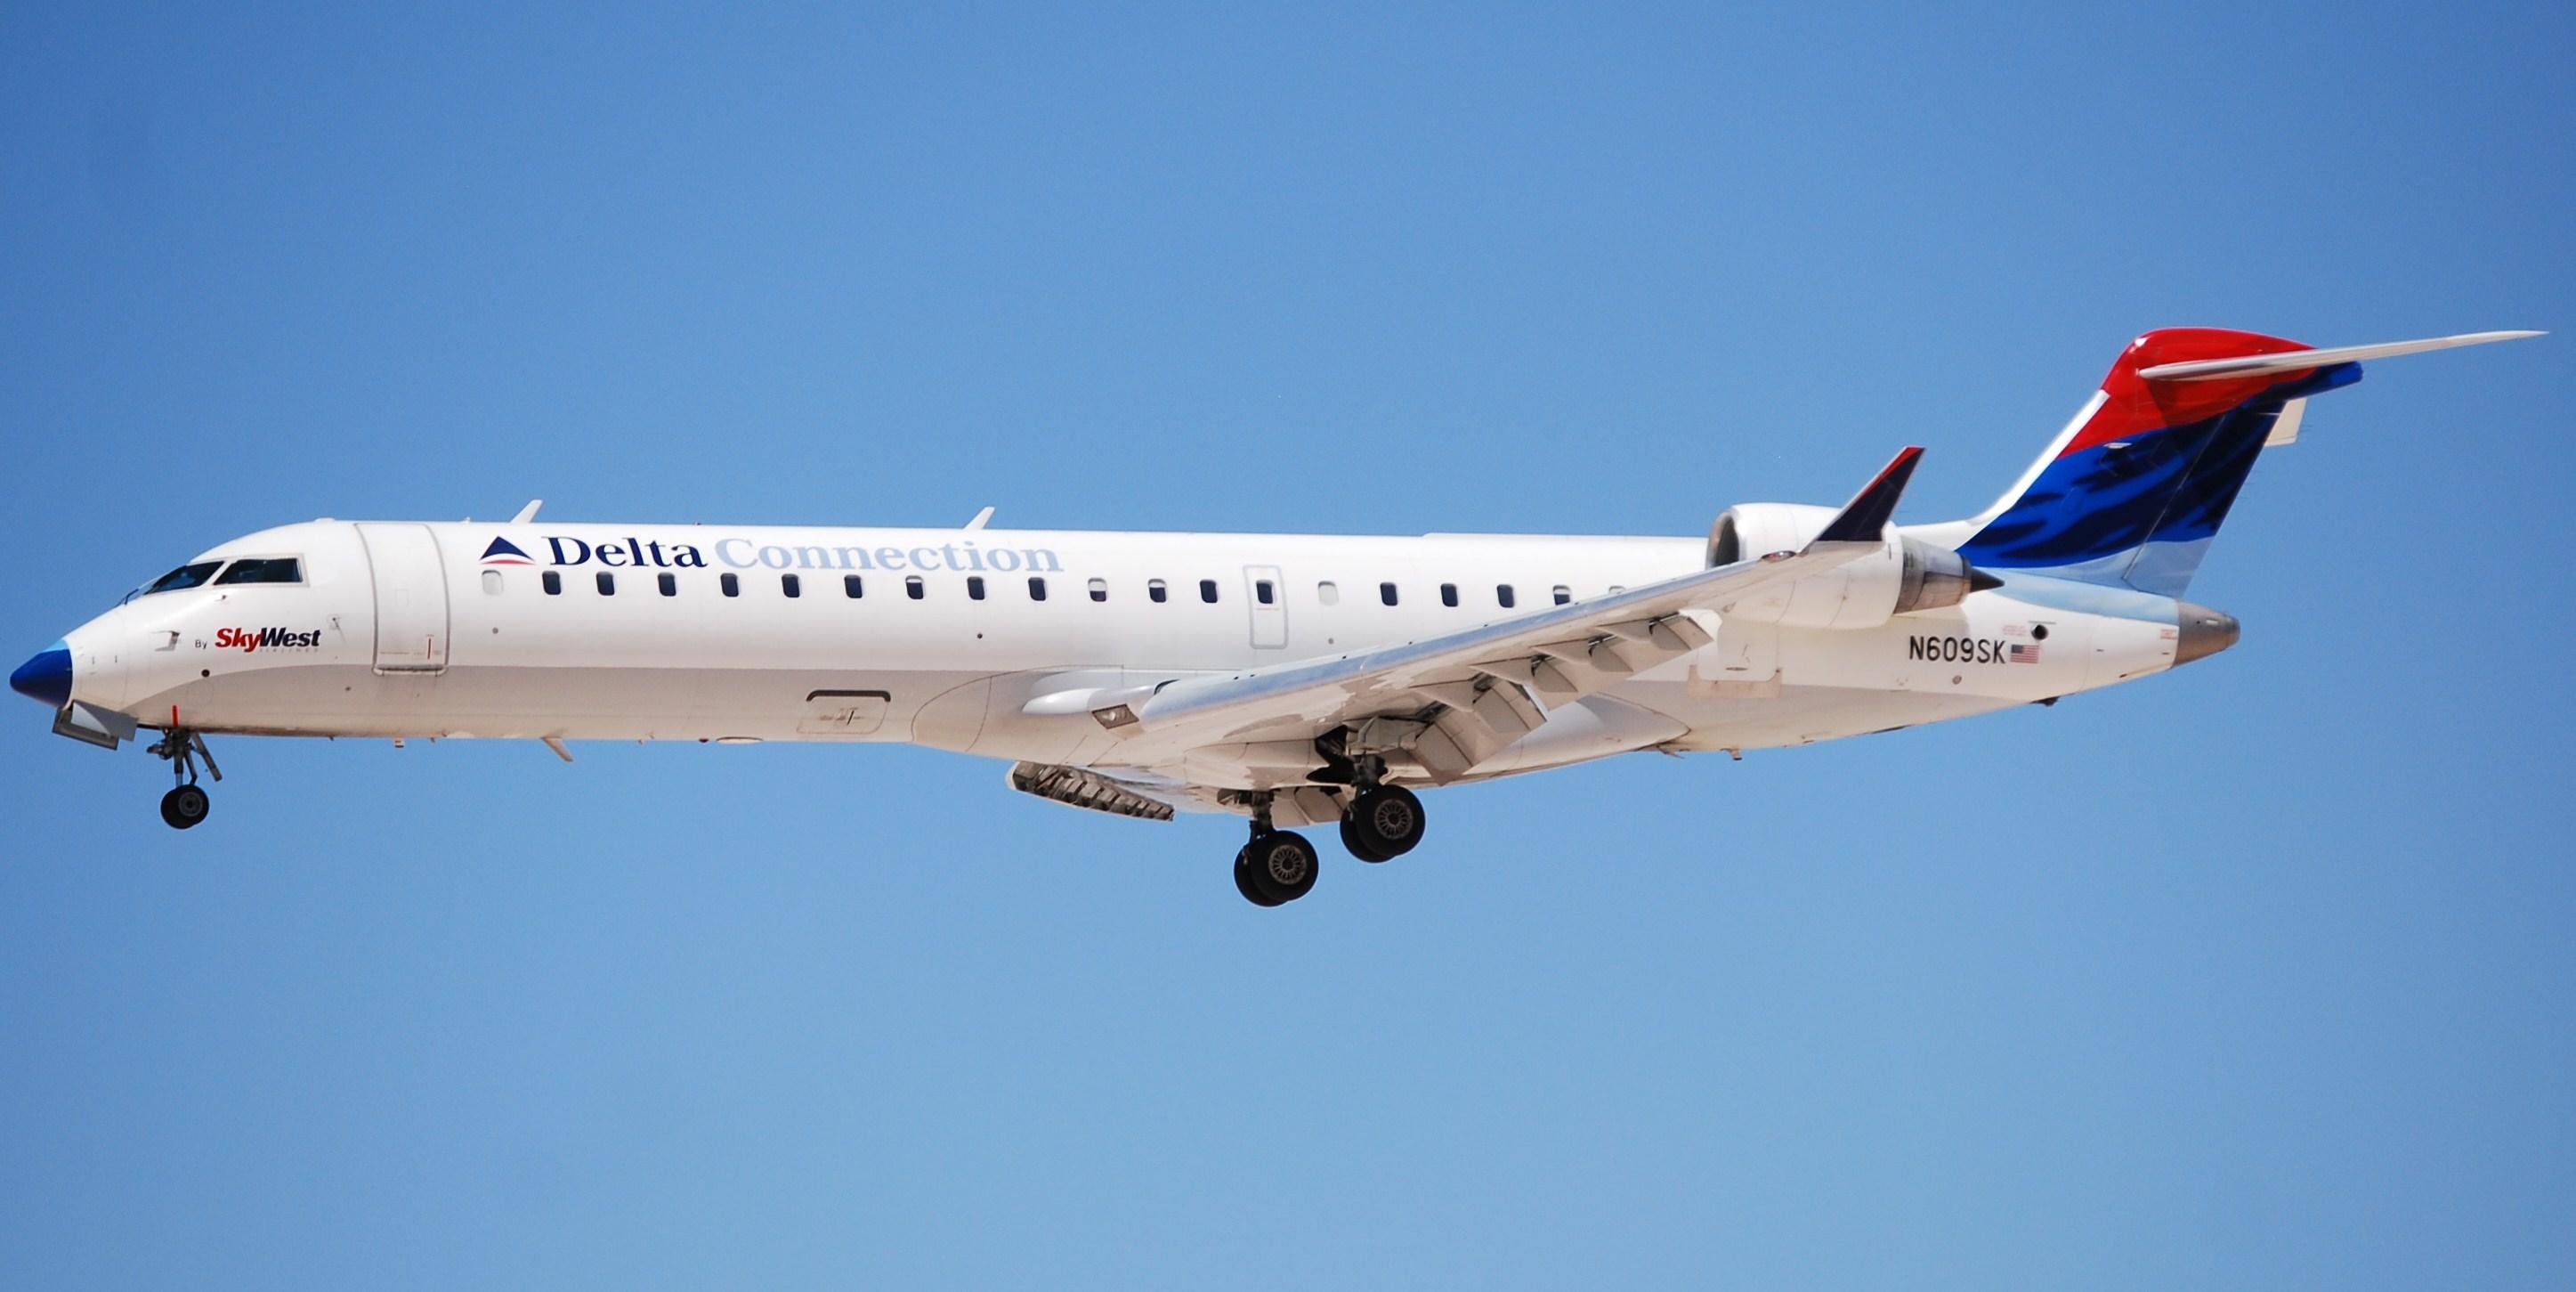 skywest cas Rosterbuster - flight and cabin crew roster app  skywest small planet  ecrew, aircrews, aviabit, asl, cas, crewdock.